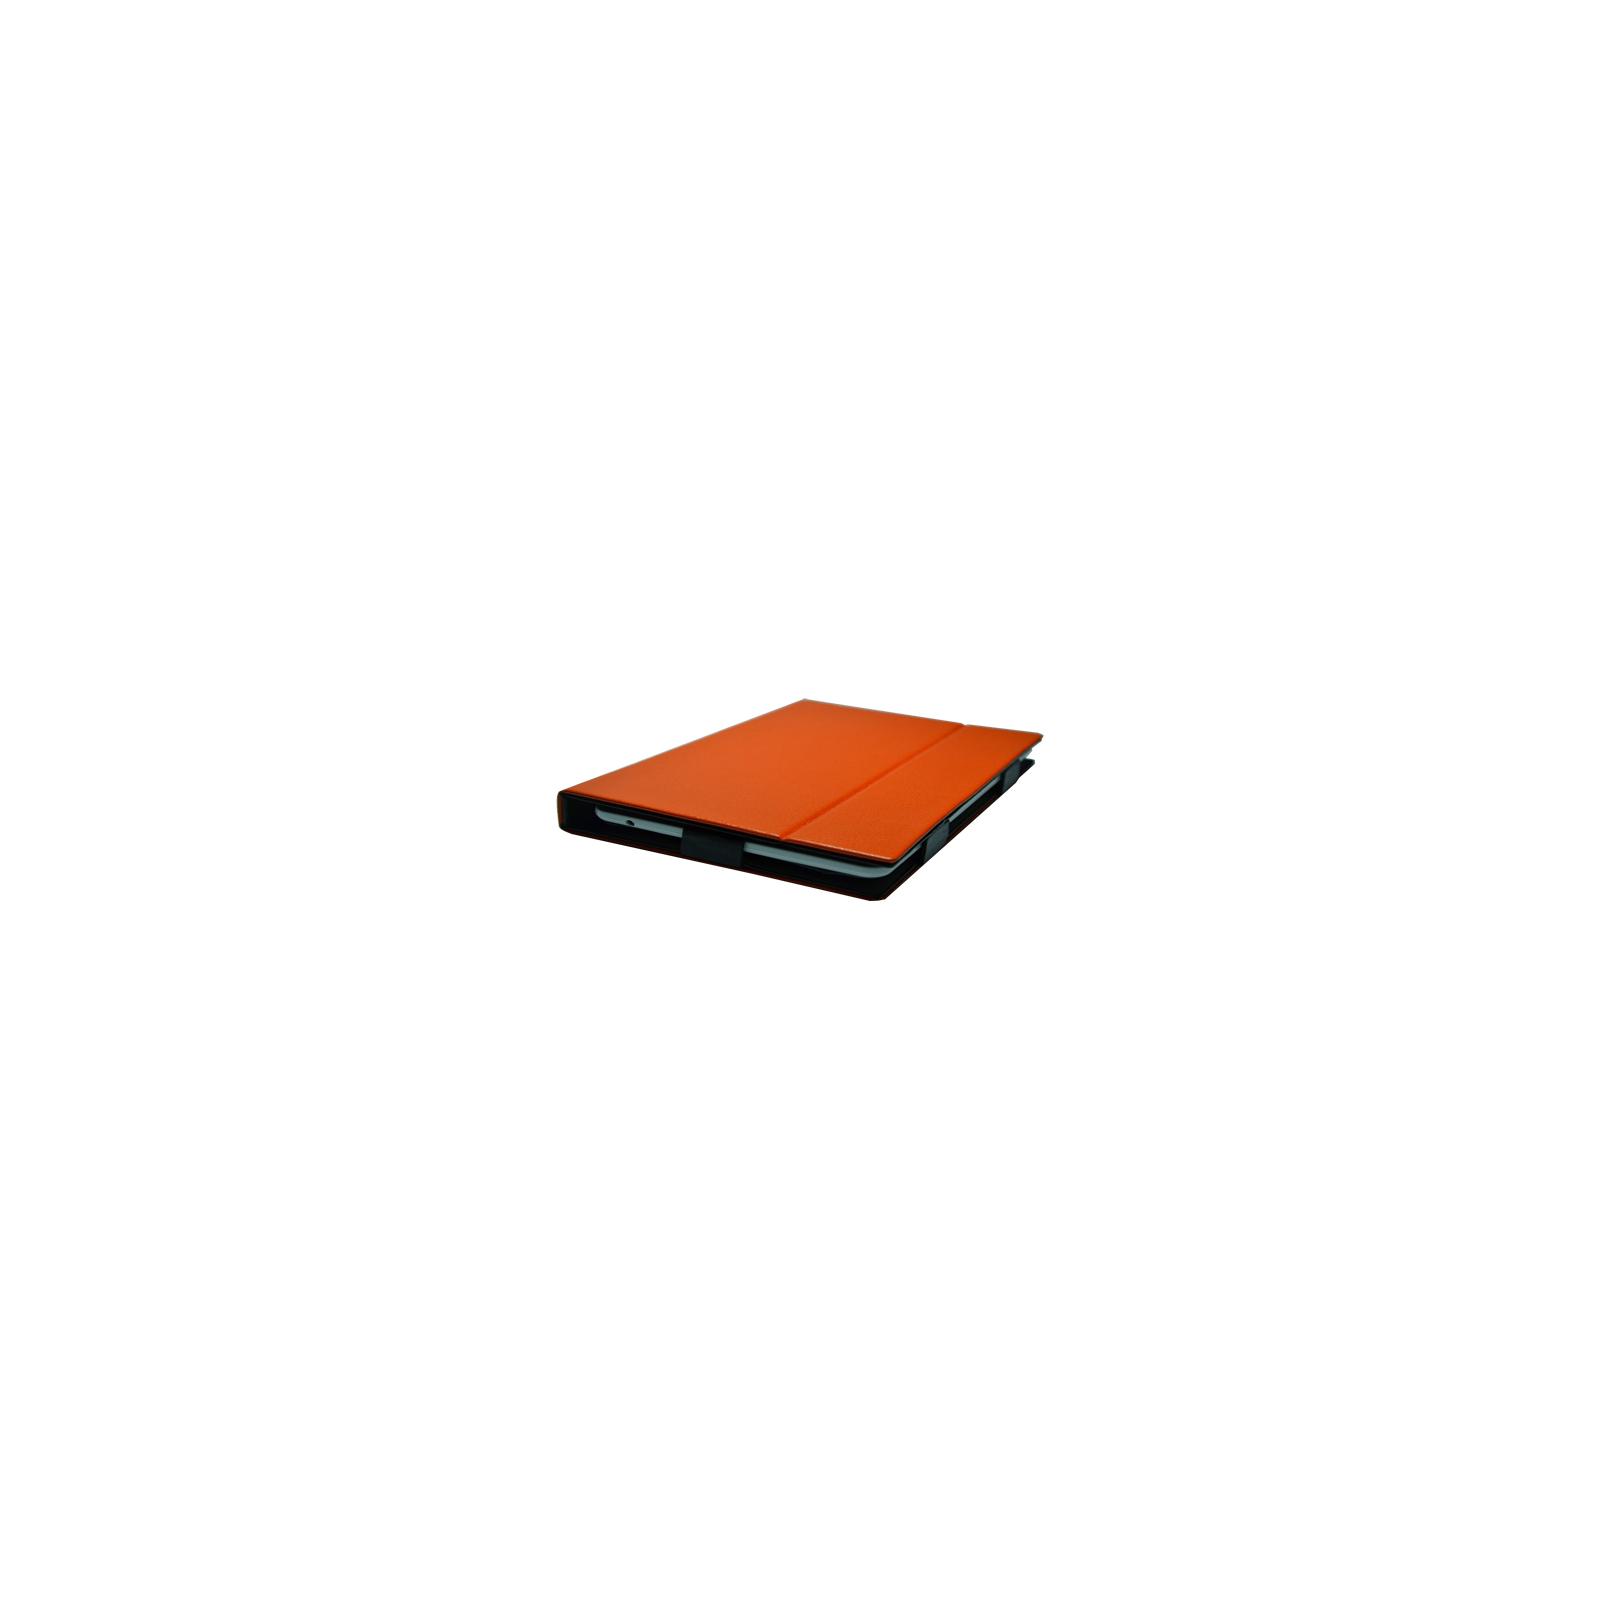 Чехол для планшета Vento 8 Desire Bright - orange изображение 3